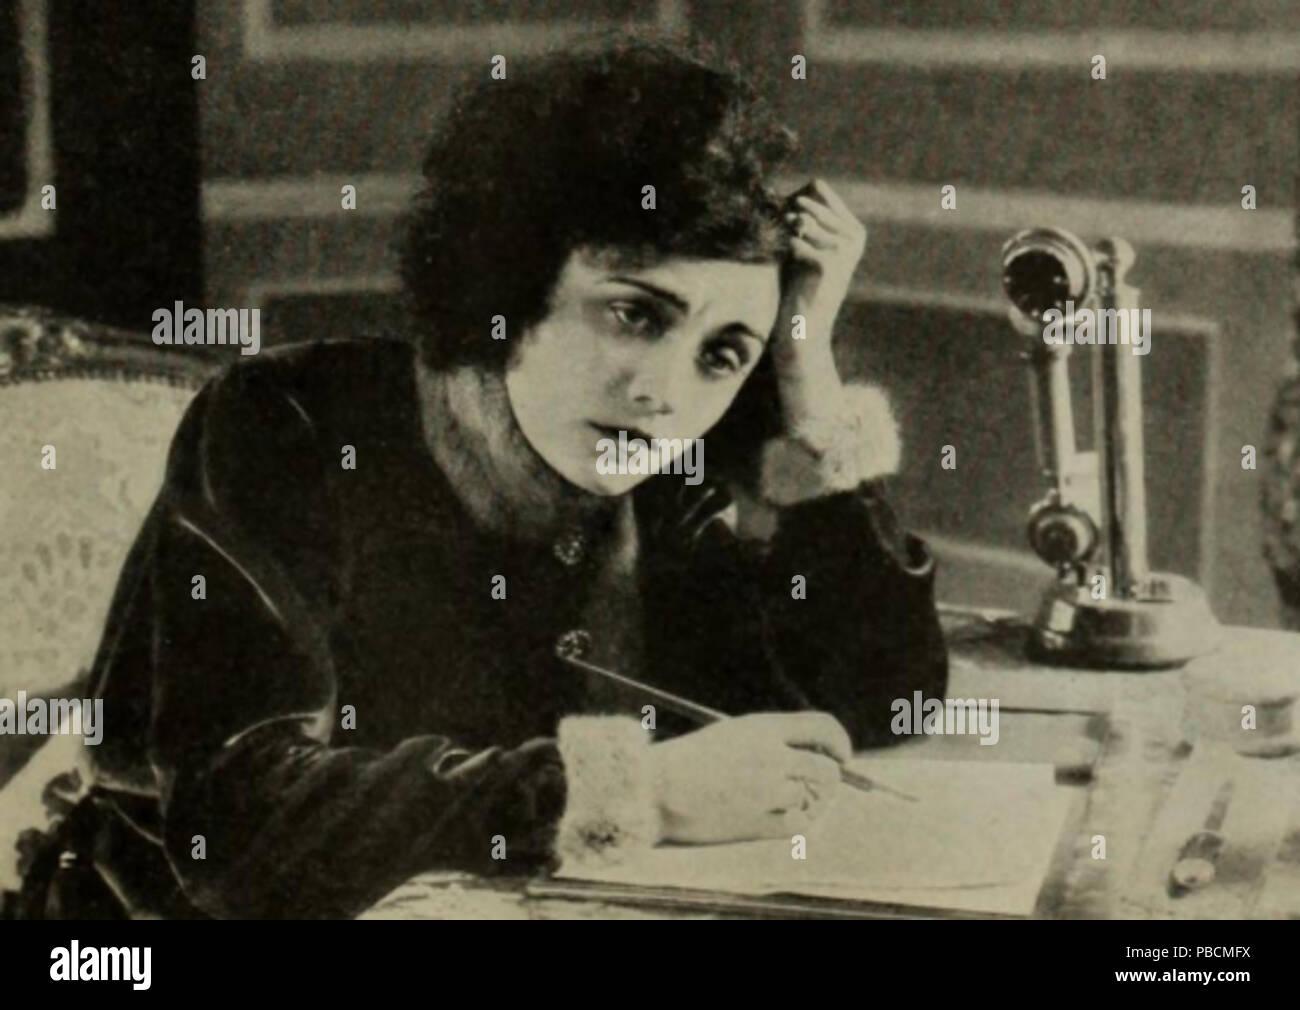 Amy Pemberton,Julia Dean (actress, born 1878) Adult tube Morgan Murphy (comedian),Francine Prieto (b. 1981)